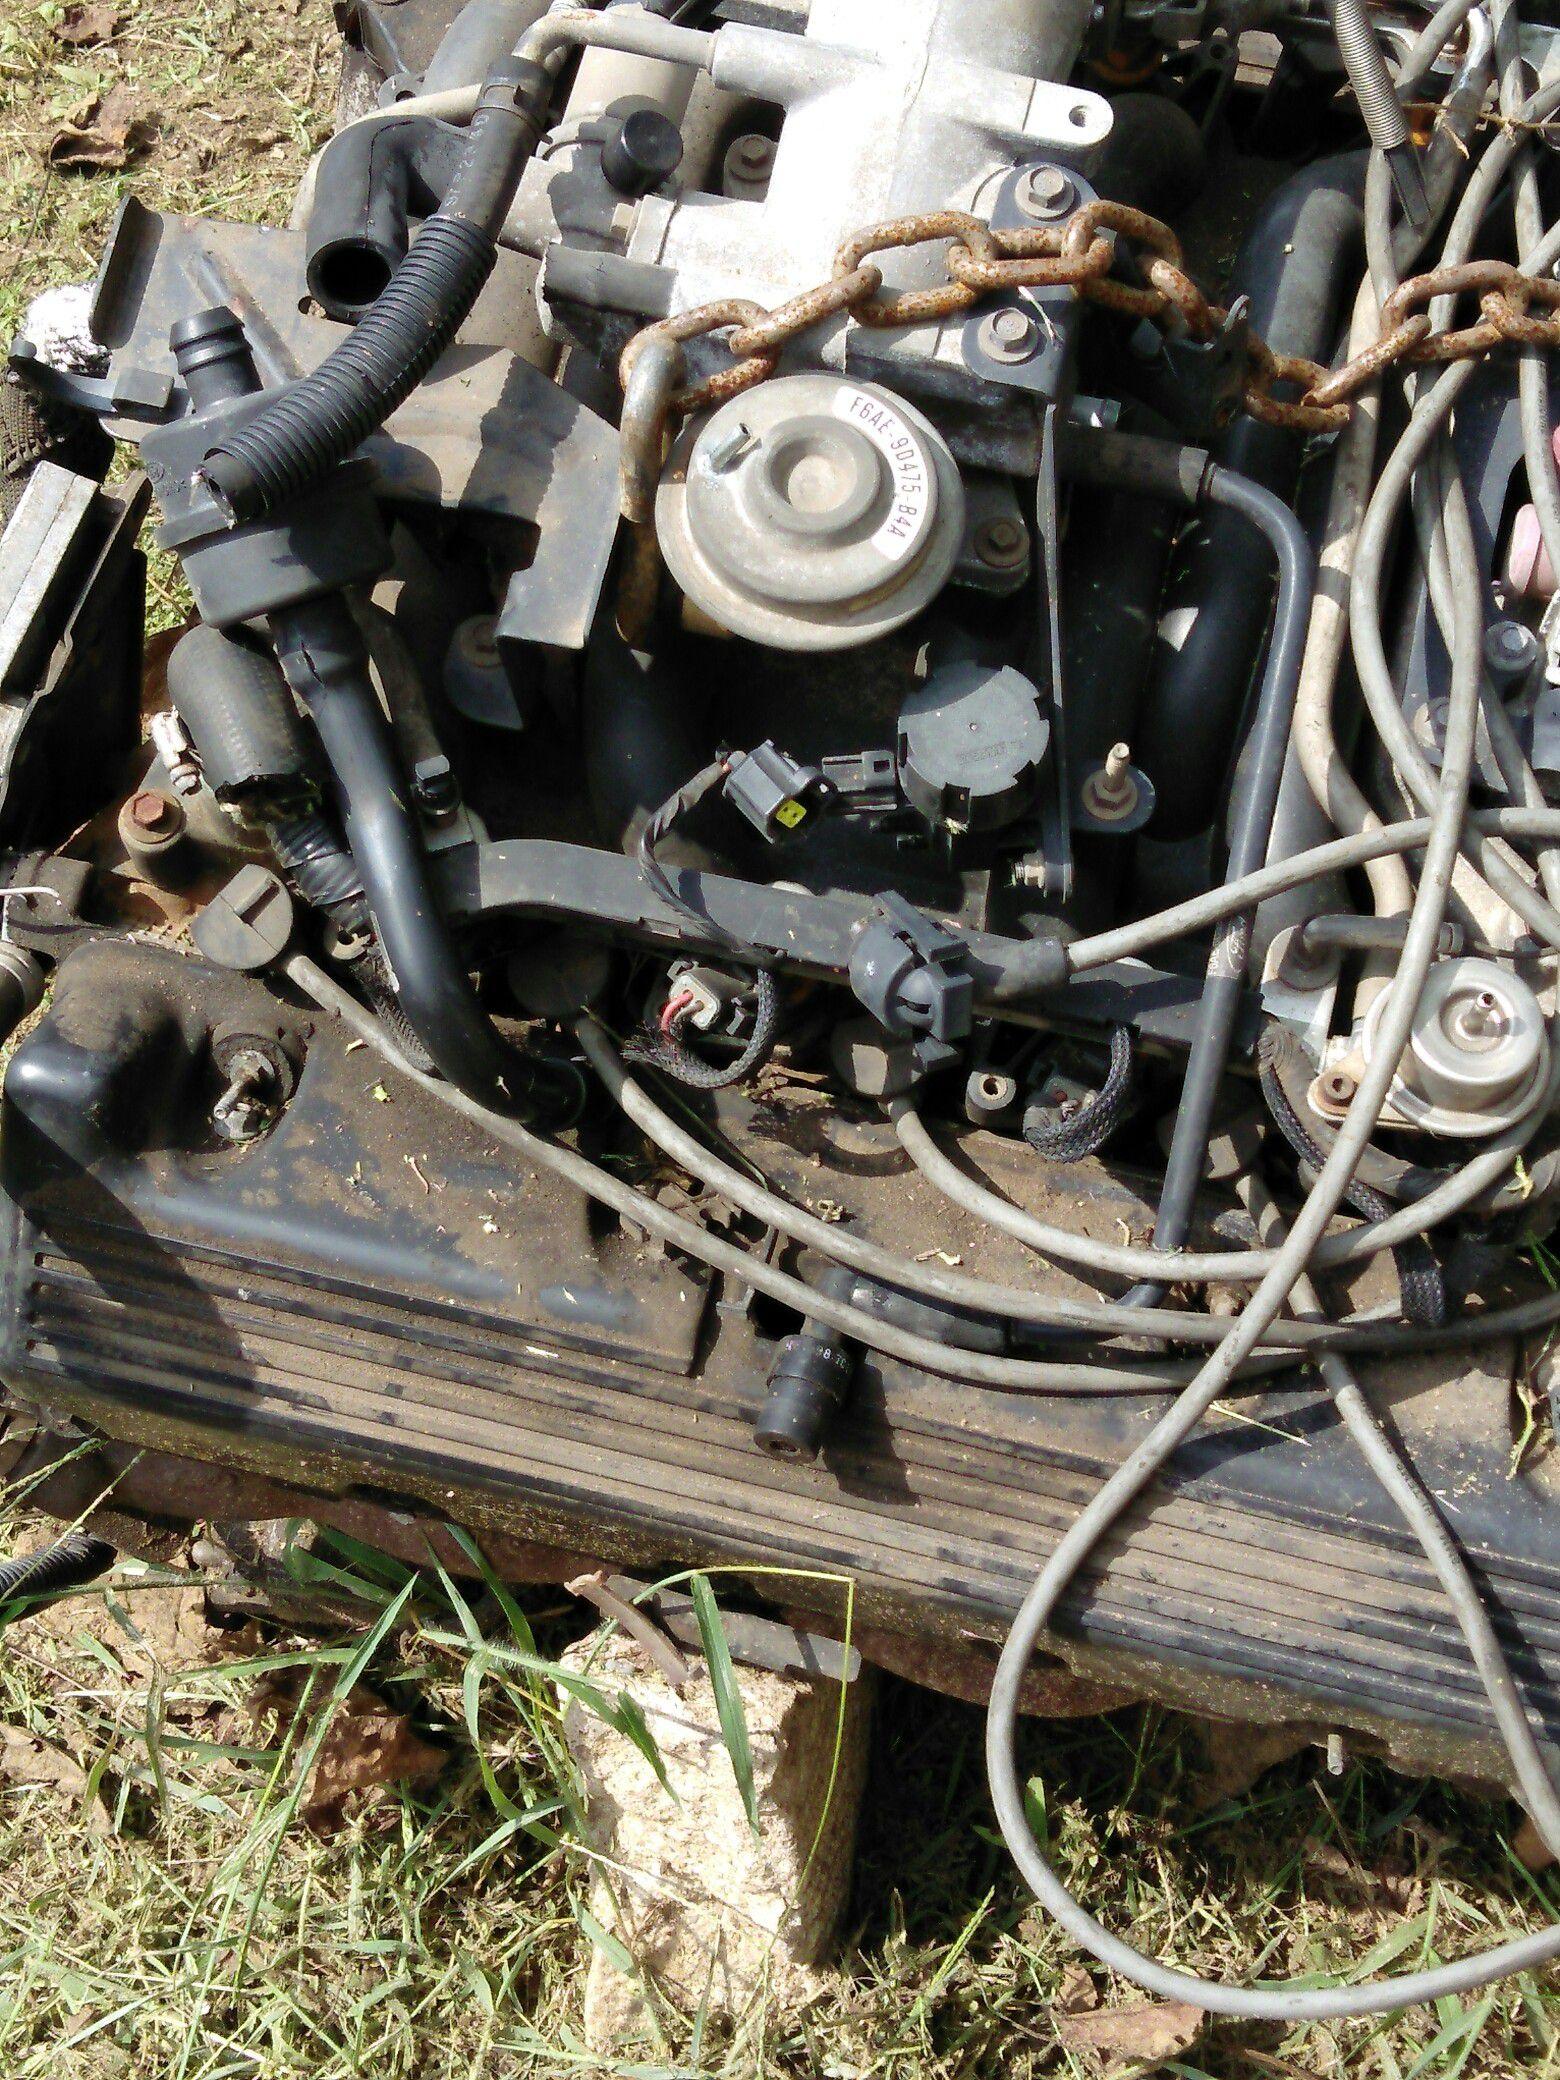 Motor 97 mercury